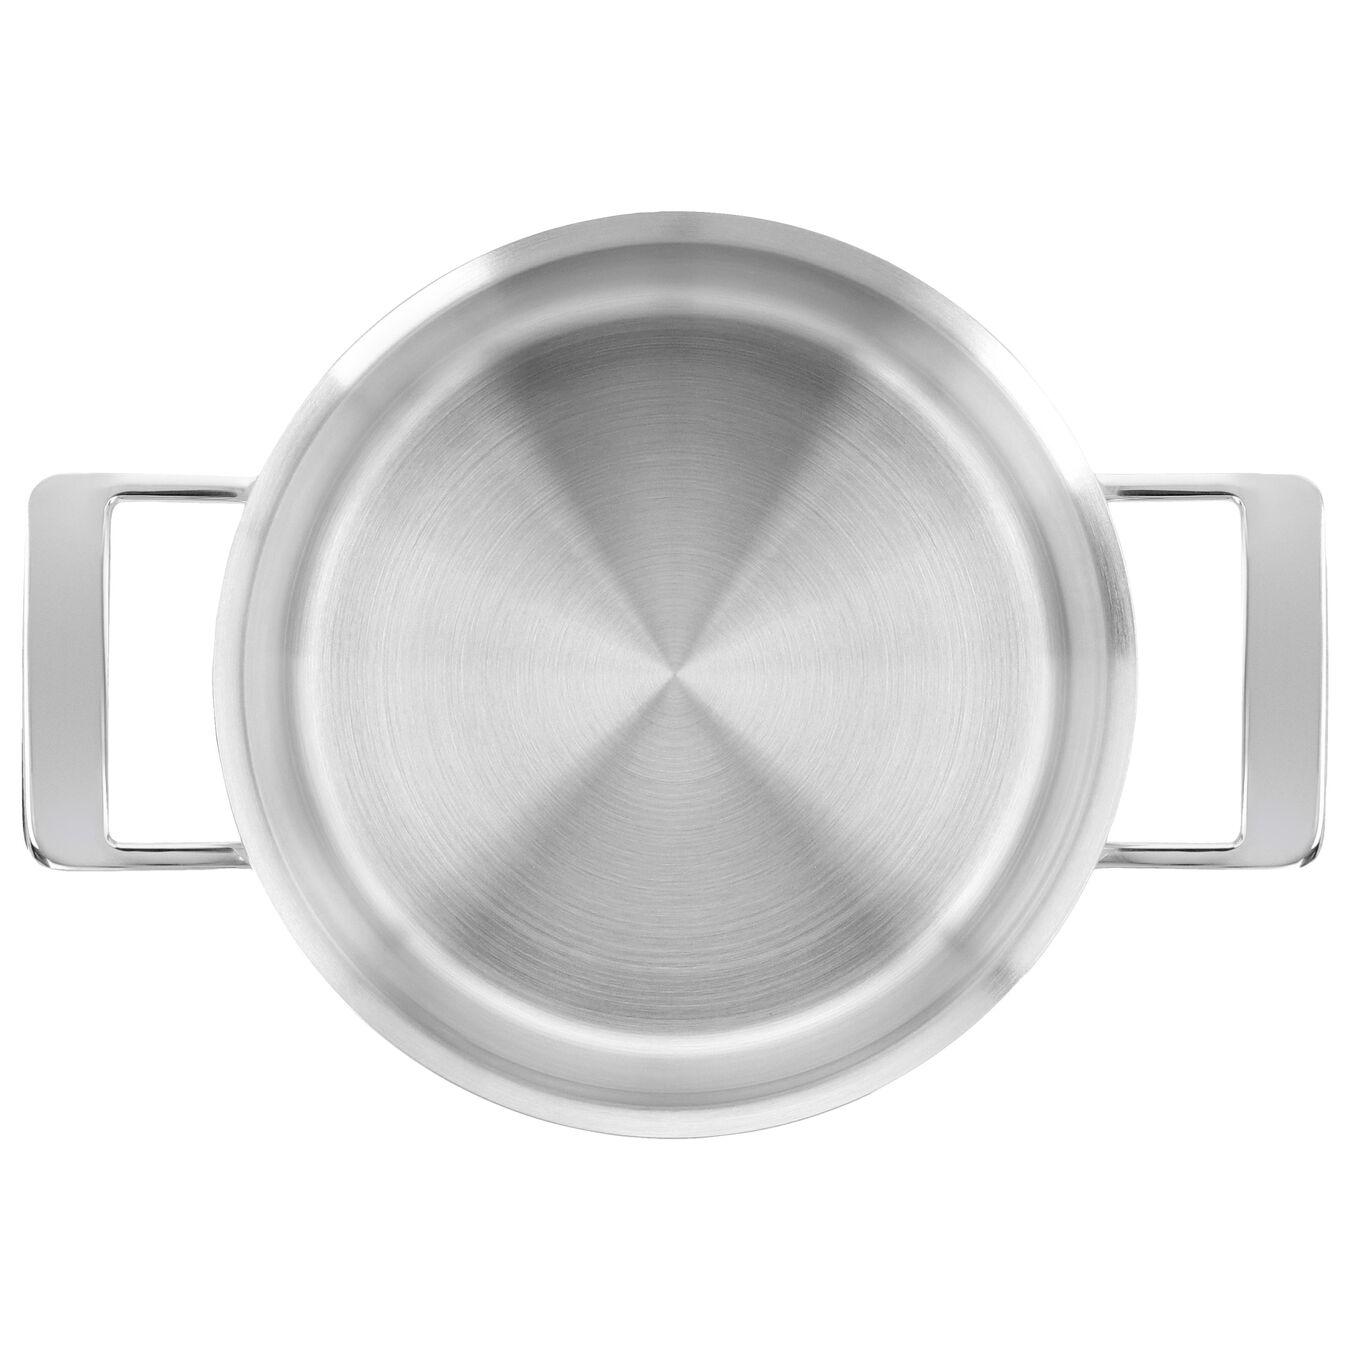 Kookpot met dubbelwandig deksel 22 cm / 4 l,,large 5